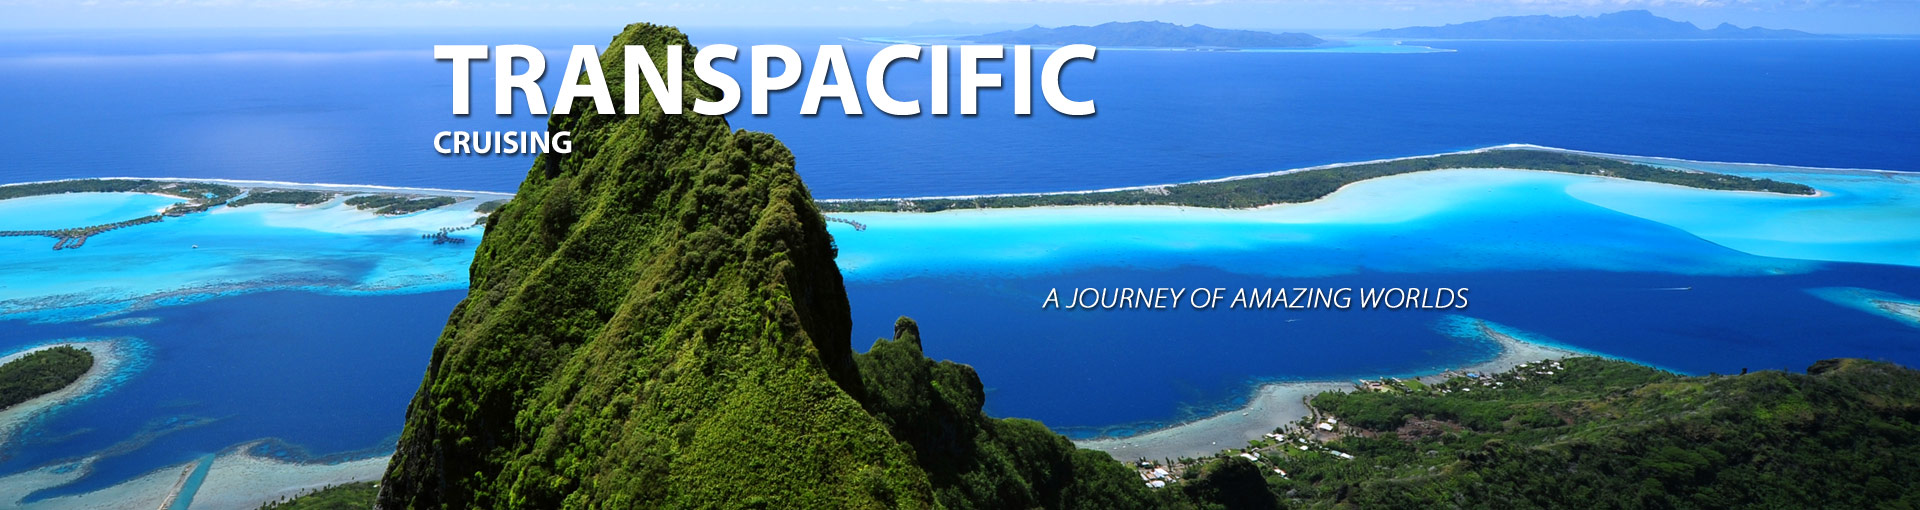 Transpacific cruises through amazing worlds